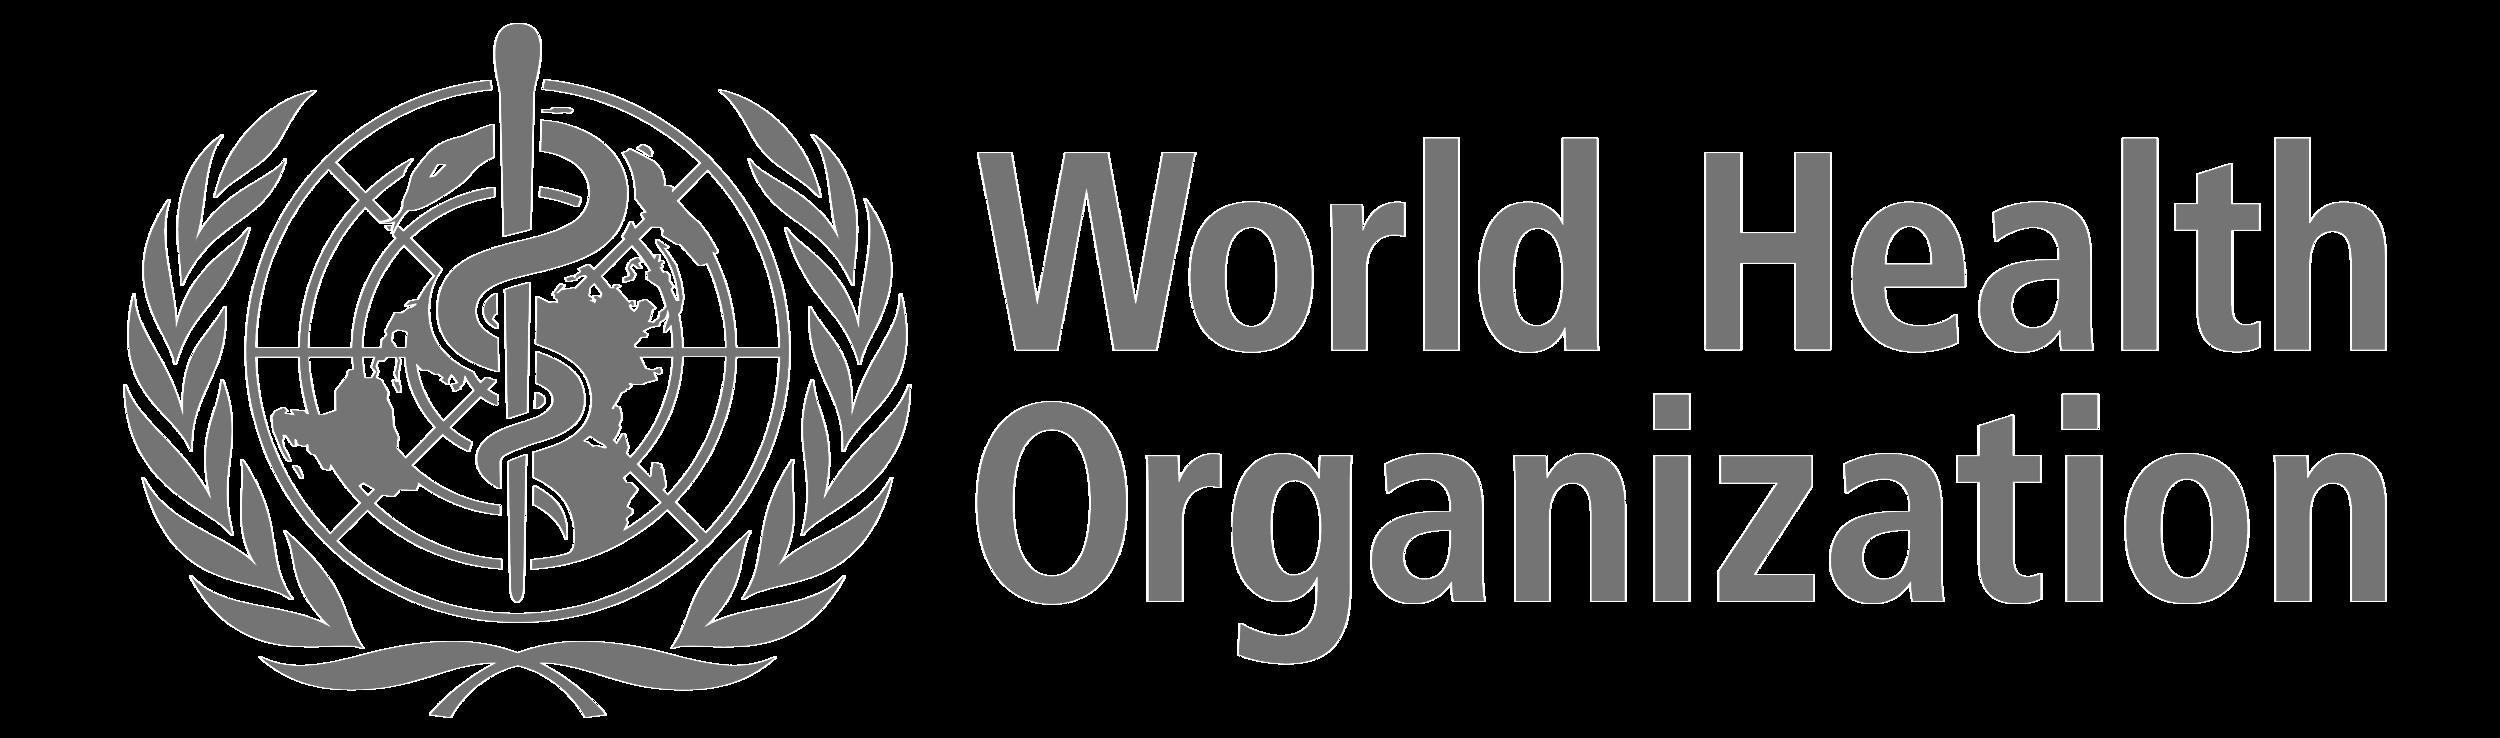 World_Health_Organization_logo_logotype.png